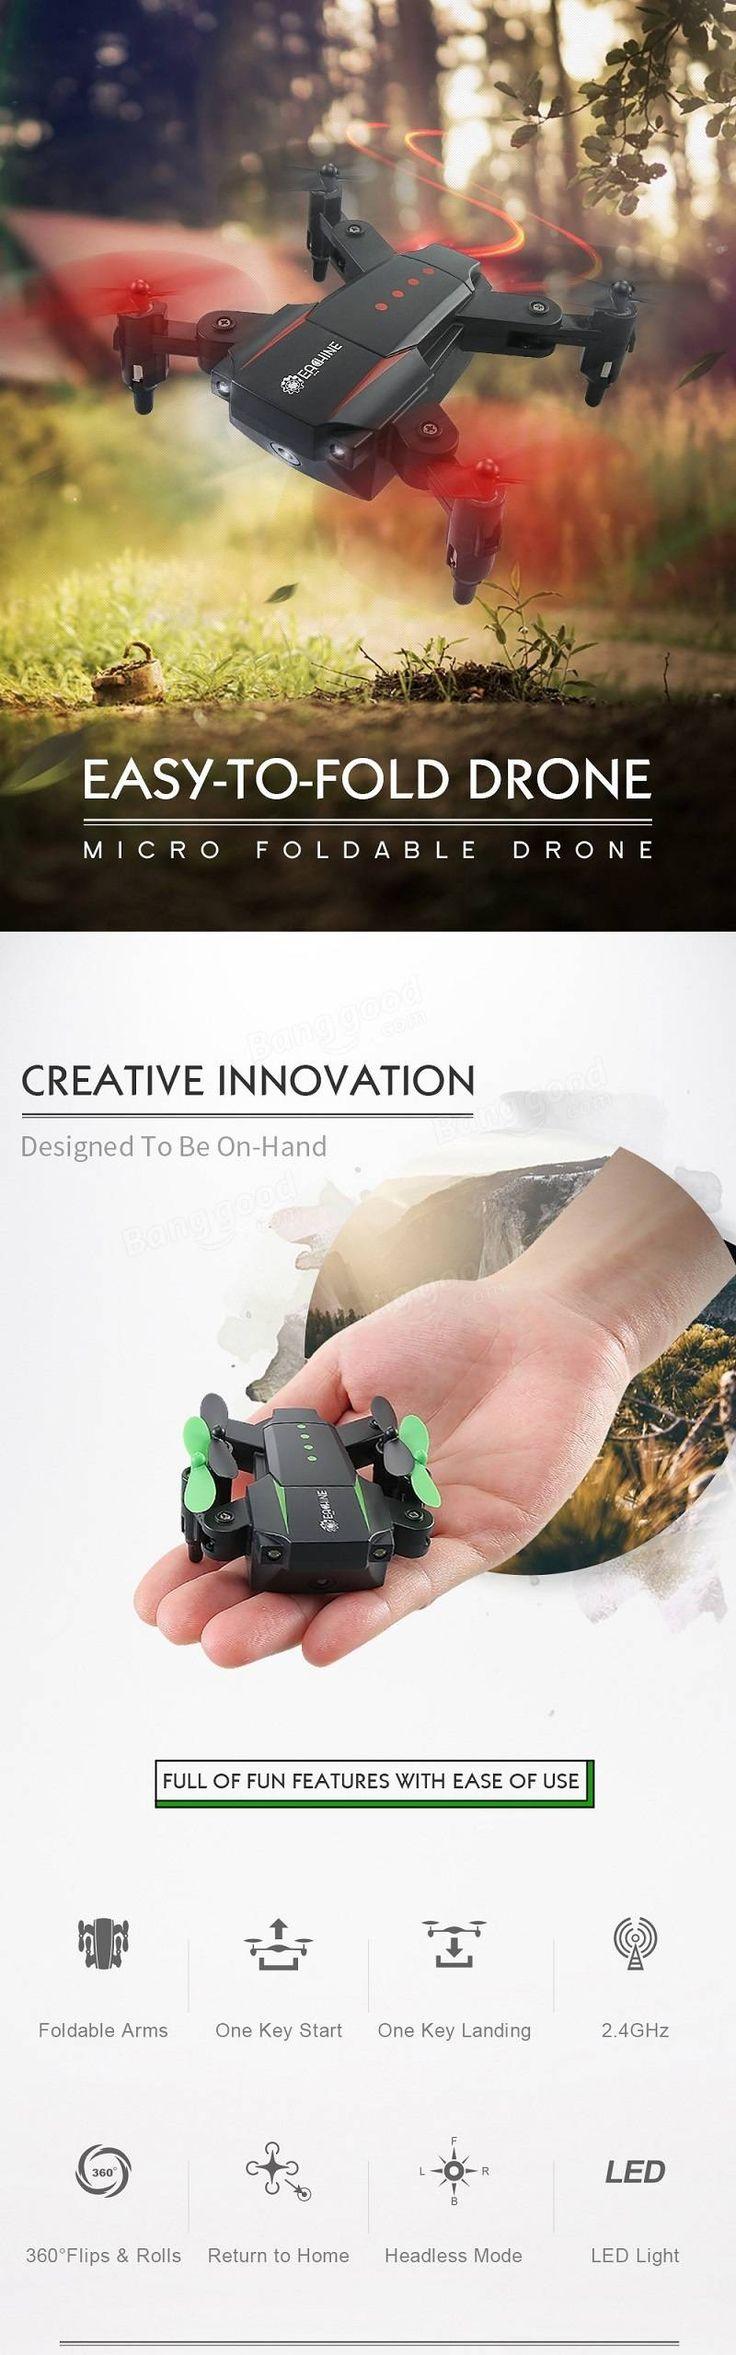 #Eachine E59 Mini 2.4G 4CH 6 Axis Foldable Arm Headless Mode #rc #drone #quadcopters #rtf #style #shopping #love